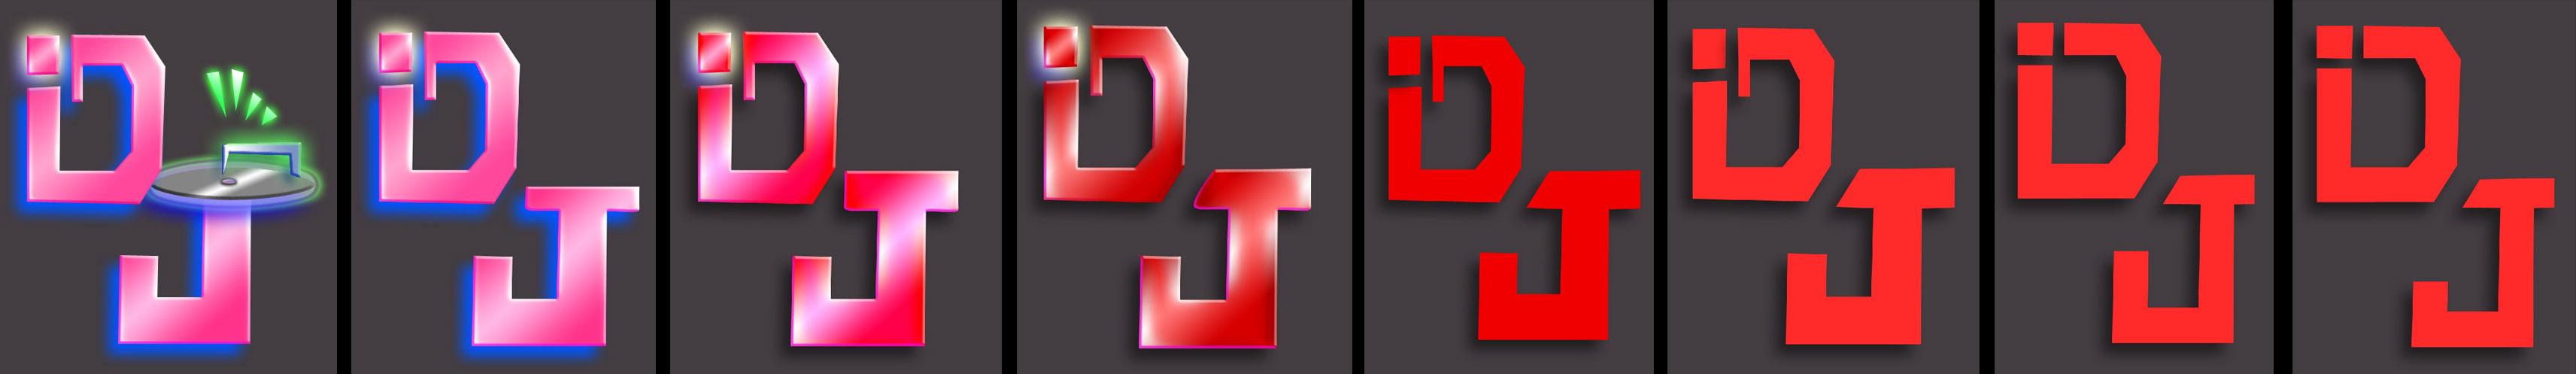 iDJ-Logo-Design-Progression